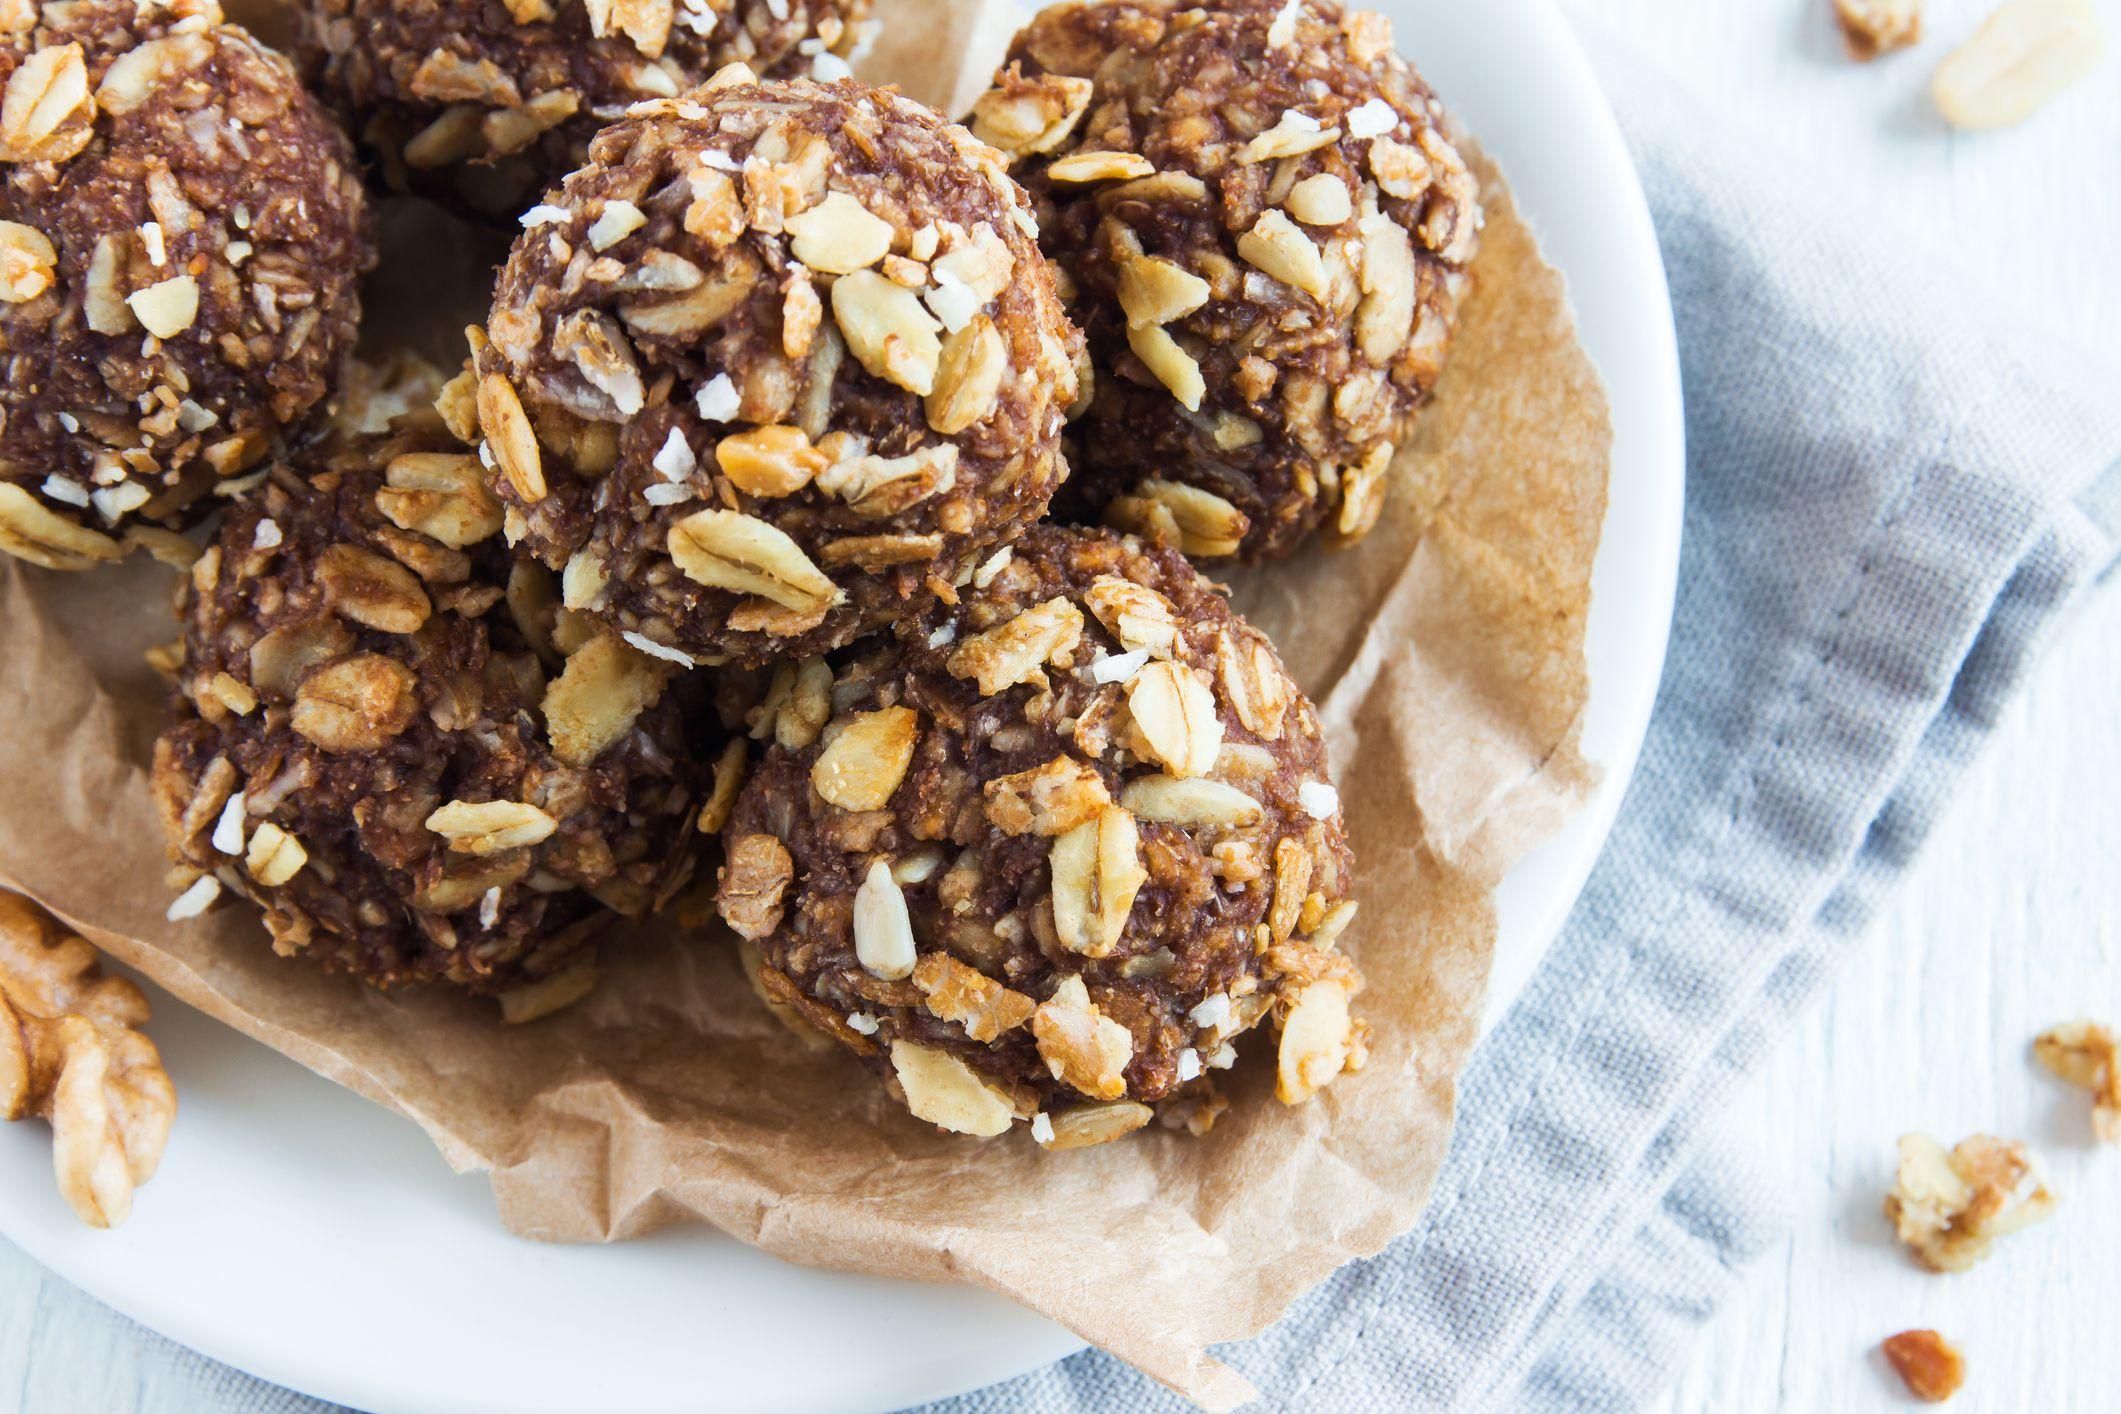 Sugar Free, No-Bake Chocolate Peanut Butter Cookies